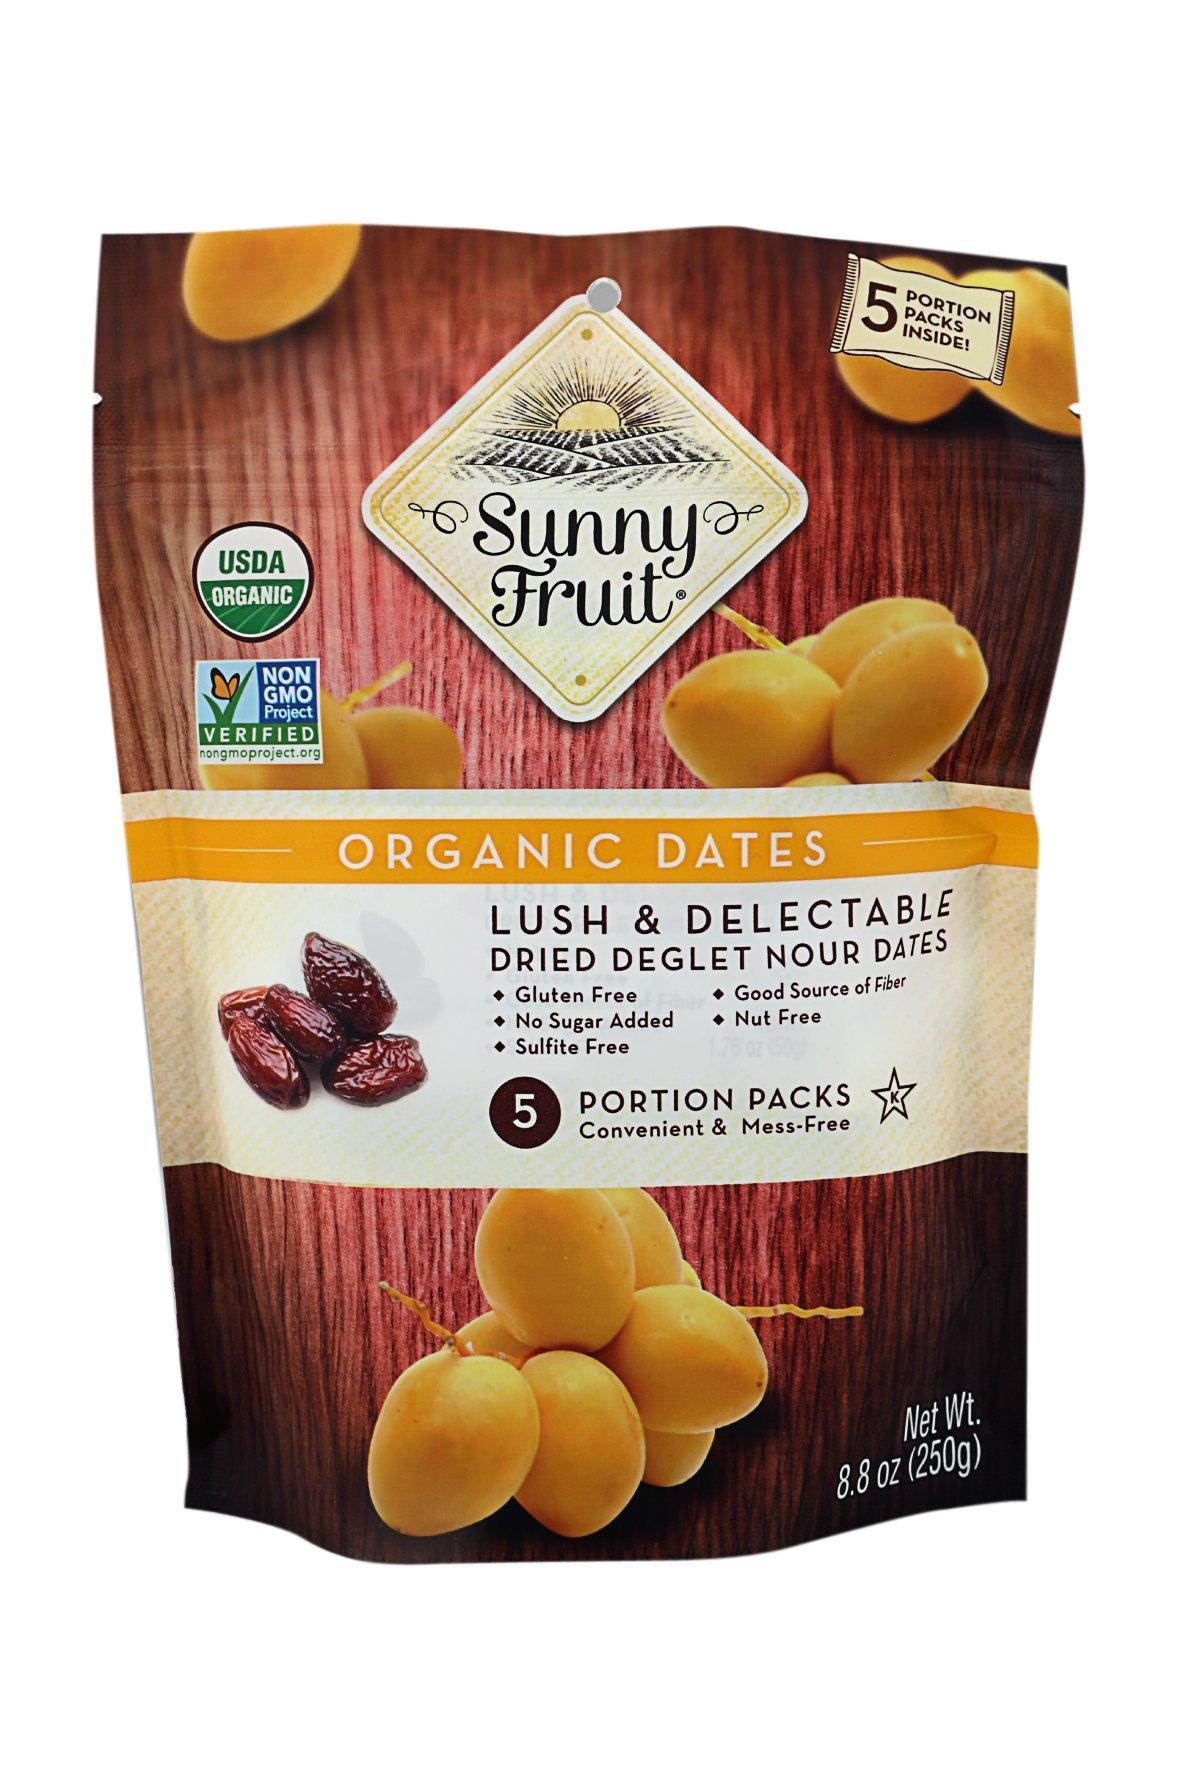 Sunny Fruit Tasty & Healthy Organic Dates 8.8 oz 2 Pack